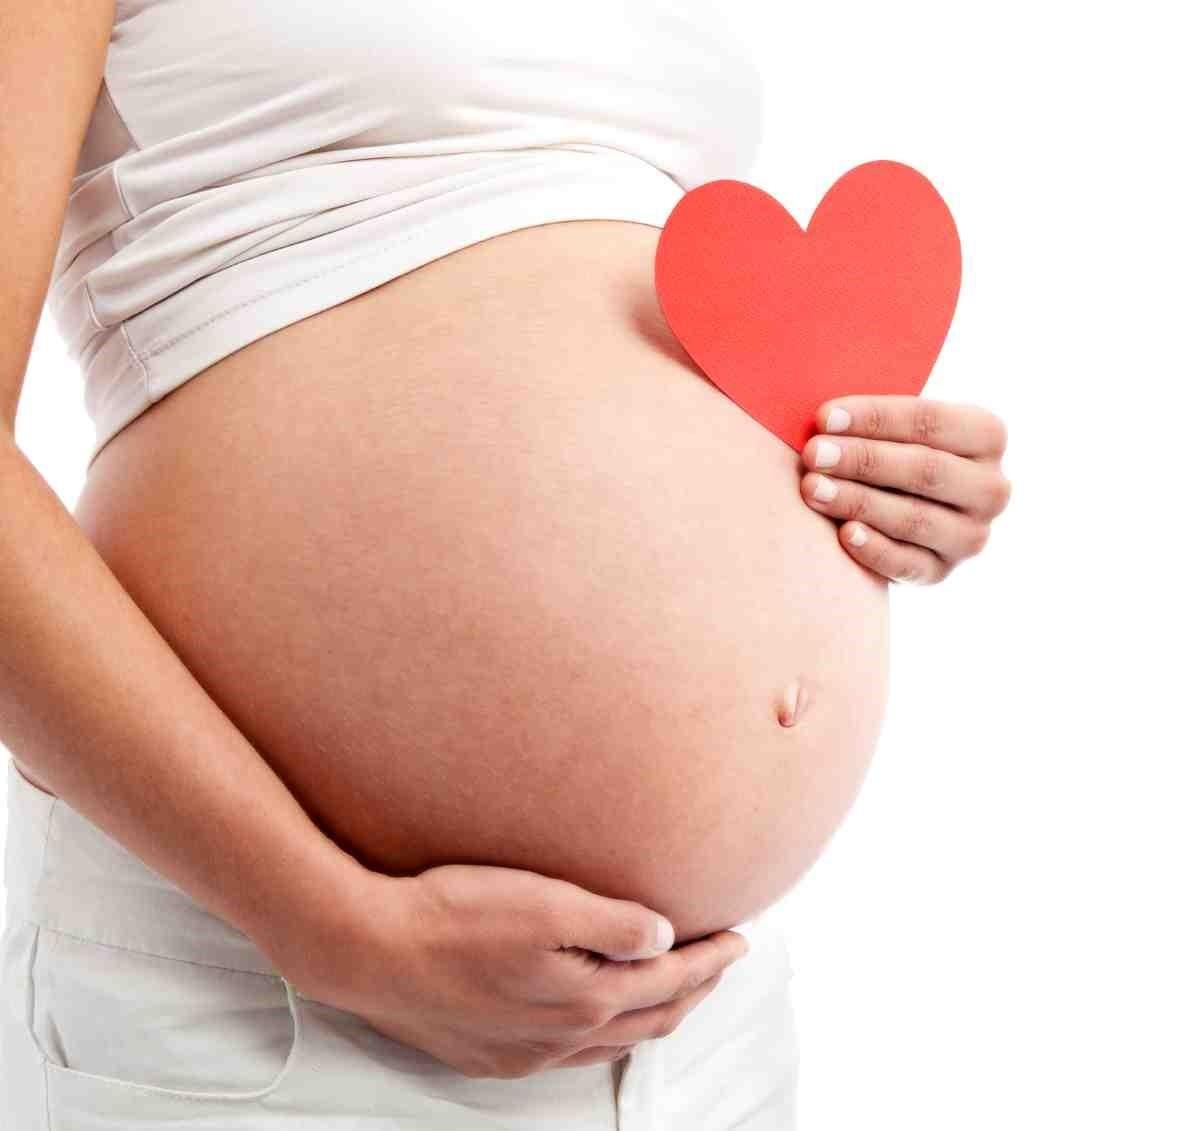 Doğal Doğum Nedir?